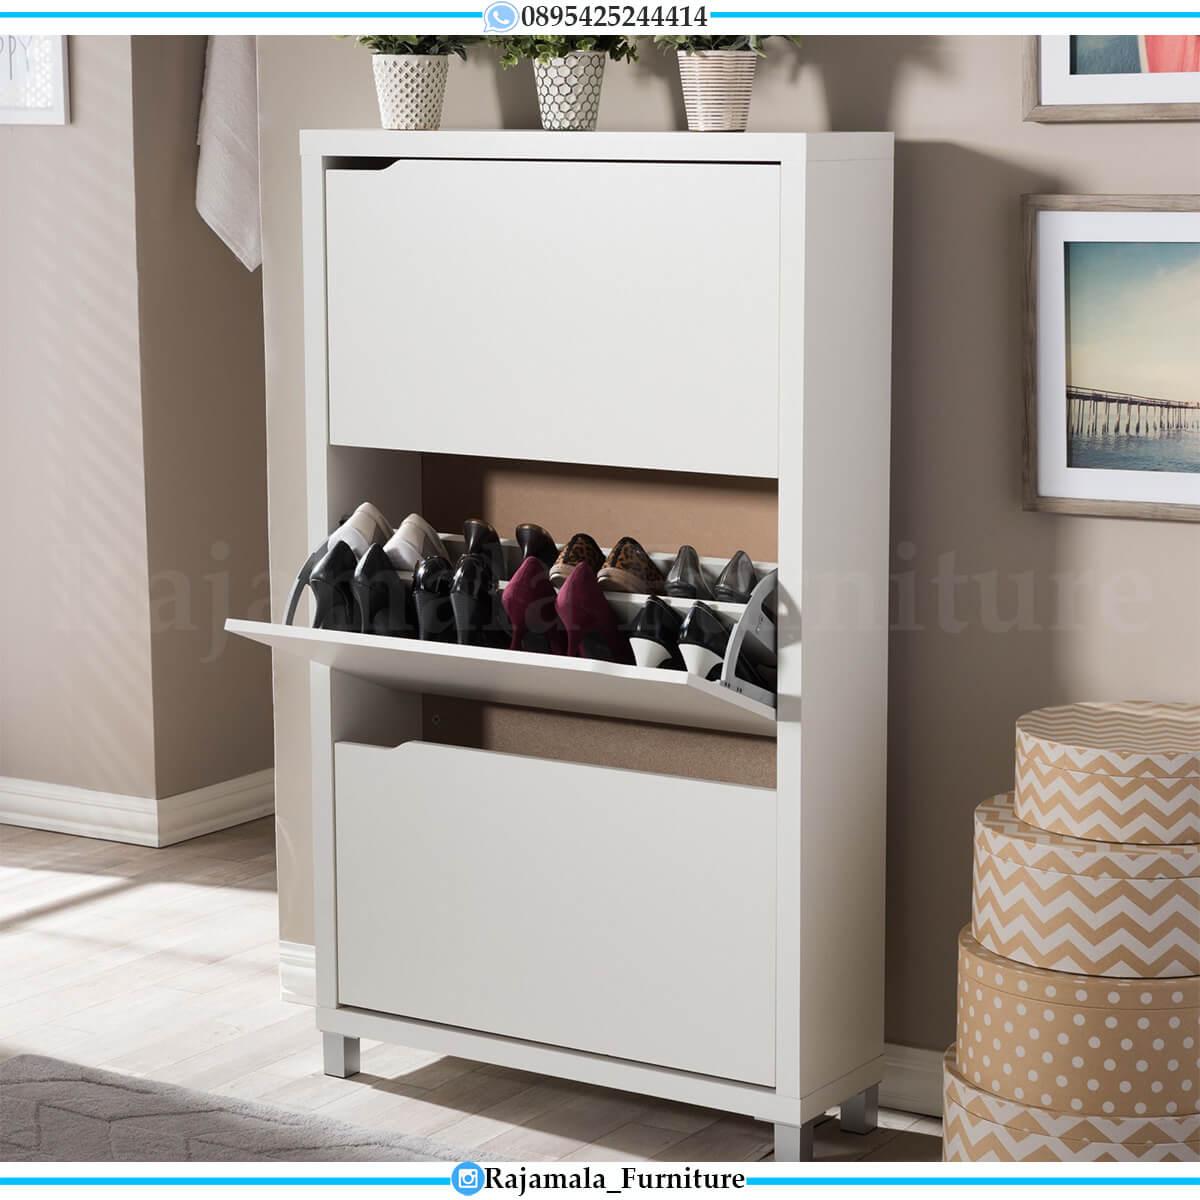 Rak Sepatu Minimalis Furniture Jepara Best Quality RM-0561